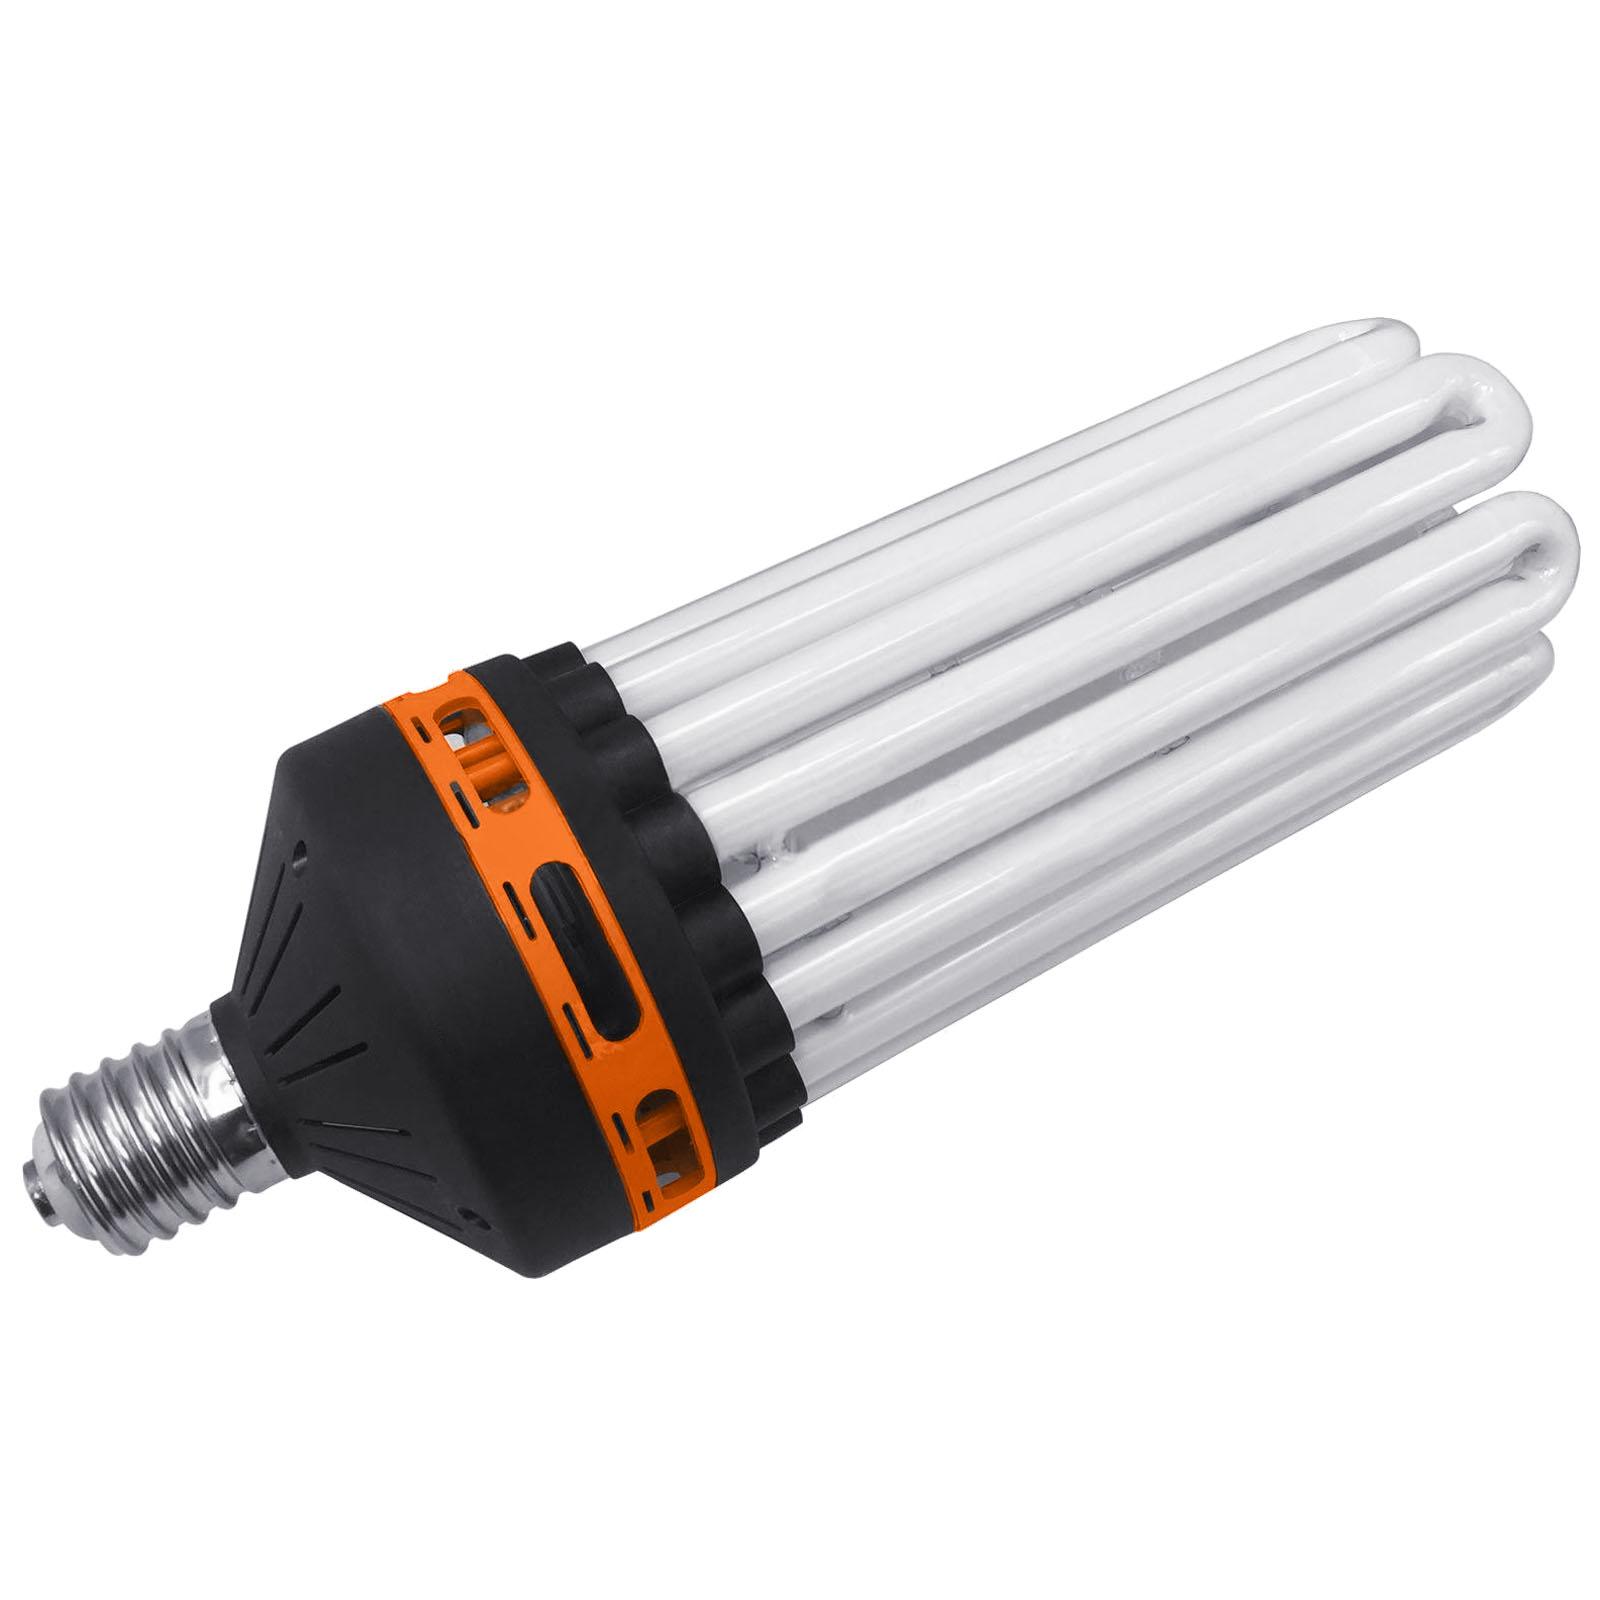 Hydroponics 125w CFL Blue Spectrum Lamp Grow Light Spectrum Bulb